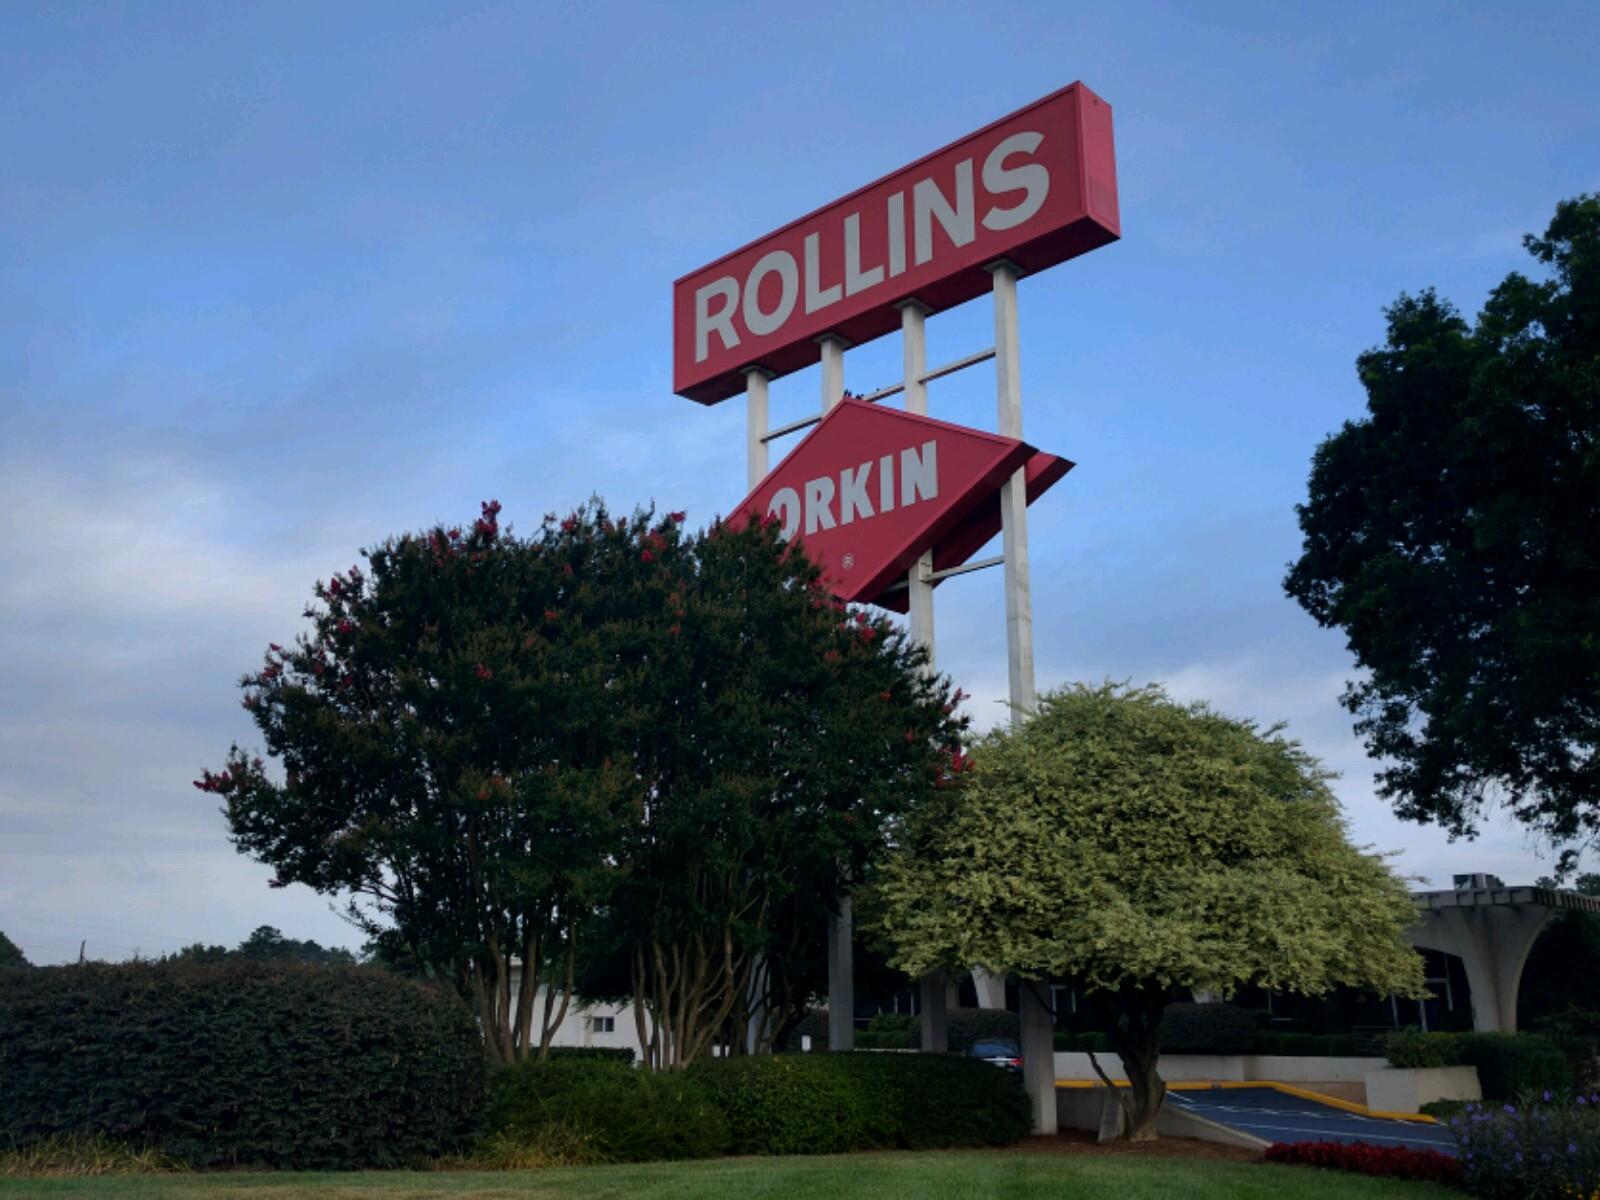 Rollins' corporate headquarters in Atlanta, Georgia.